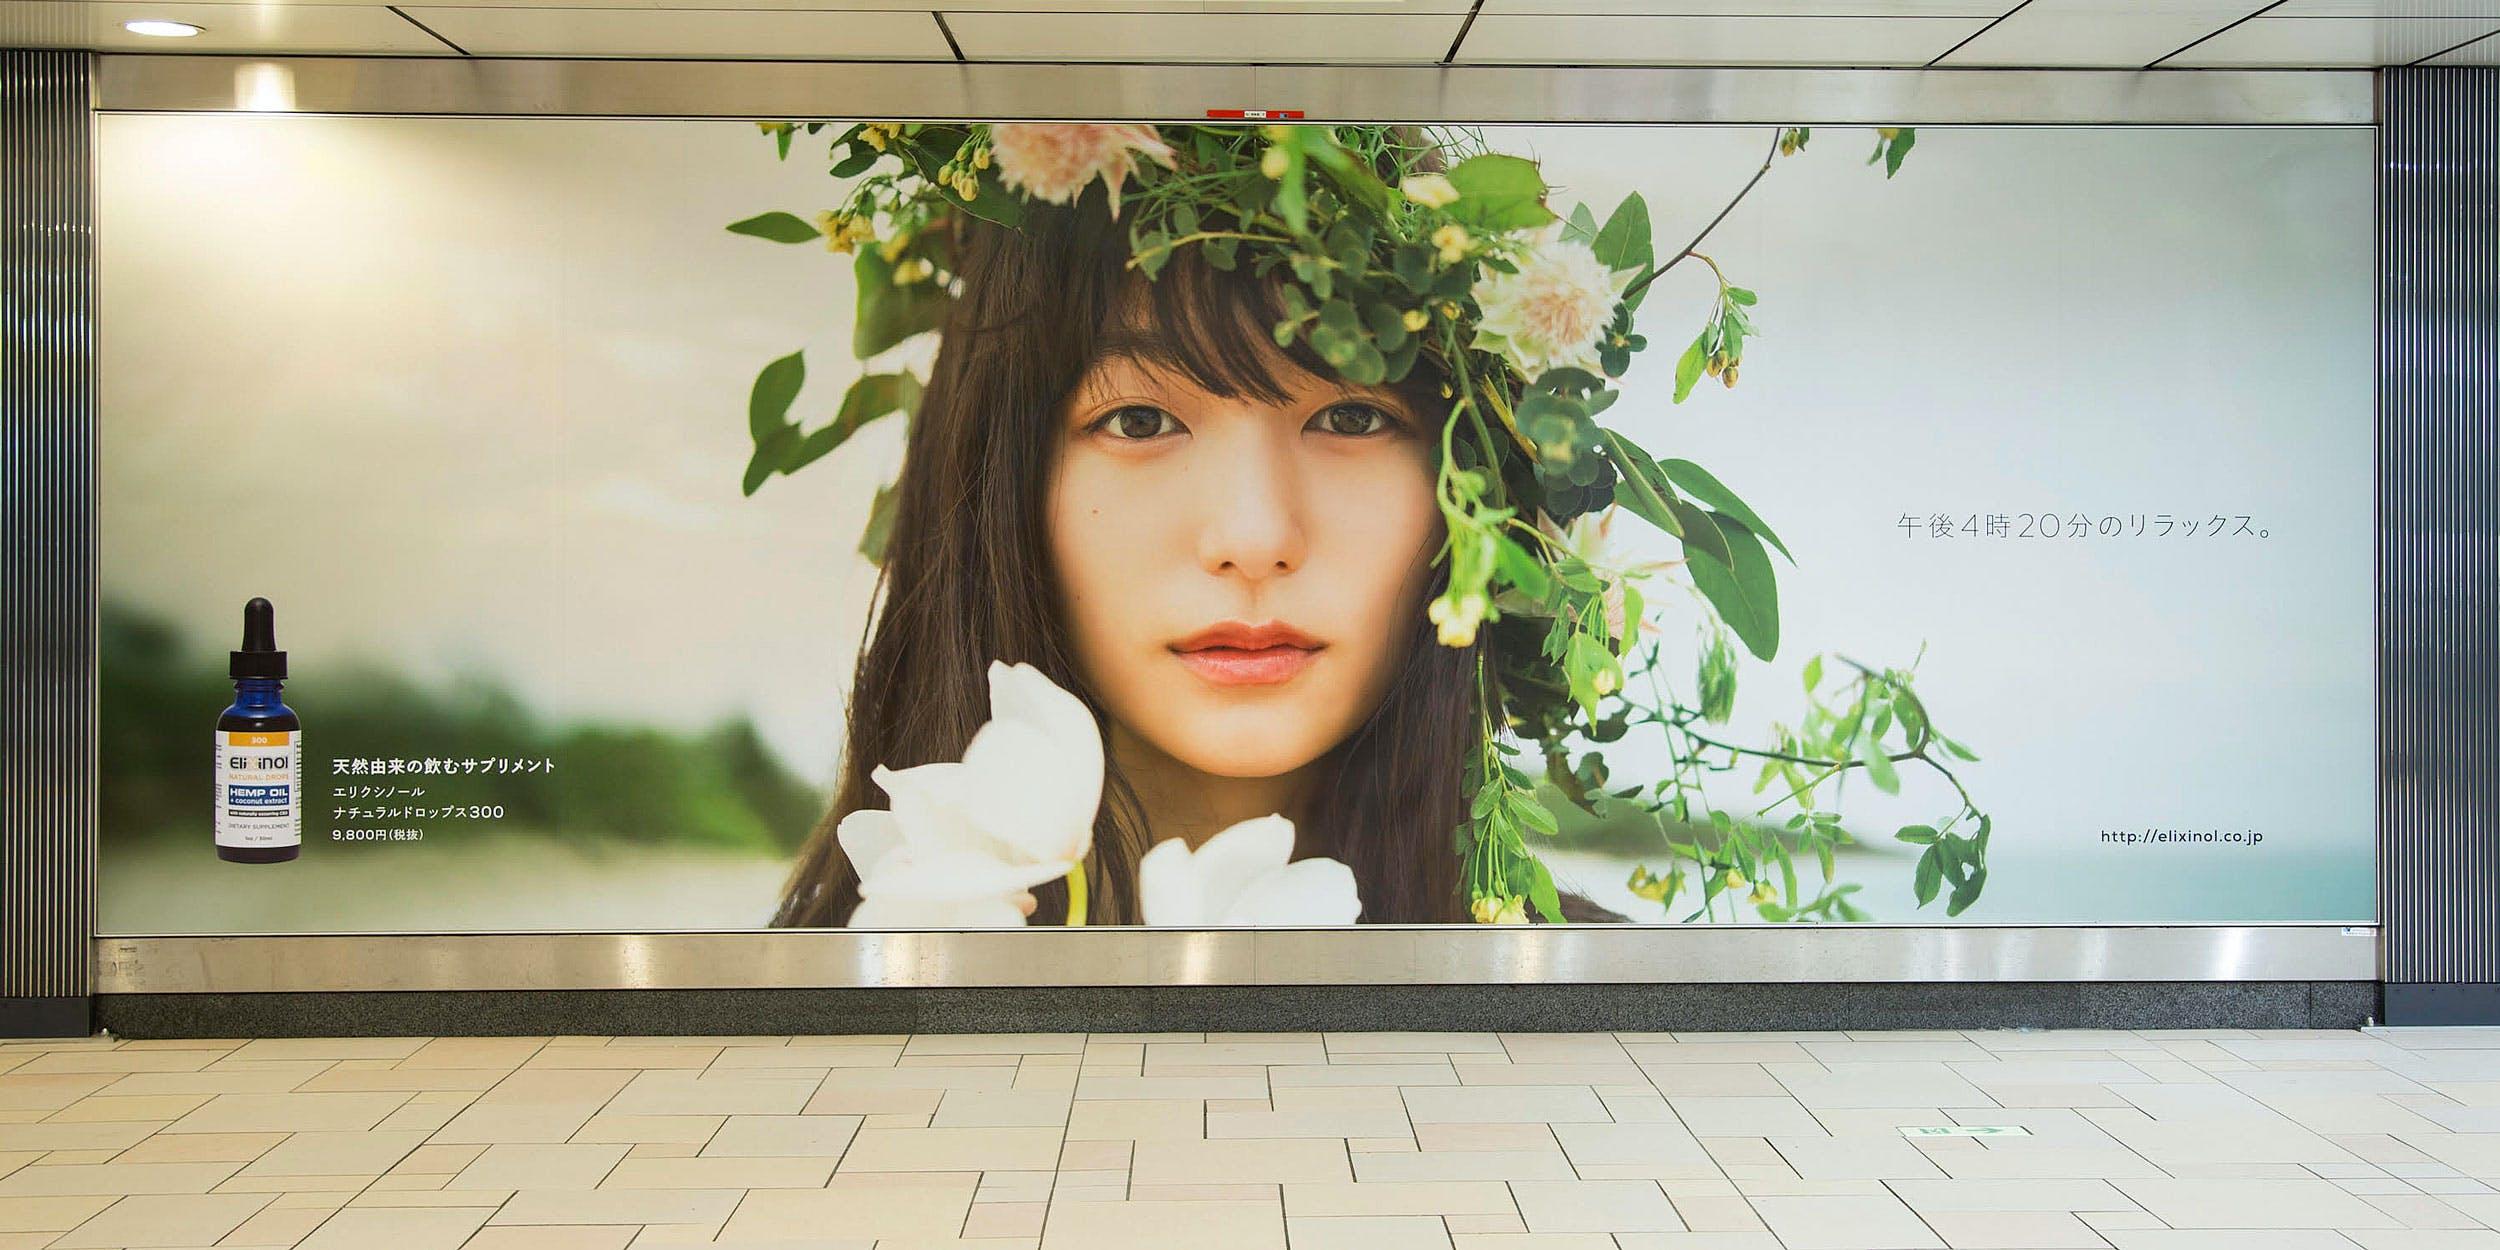 Japan CBD Oil Advertisement